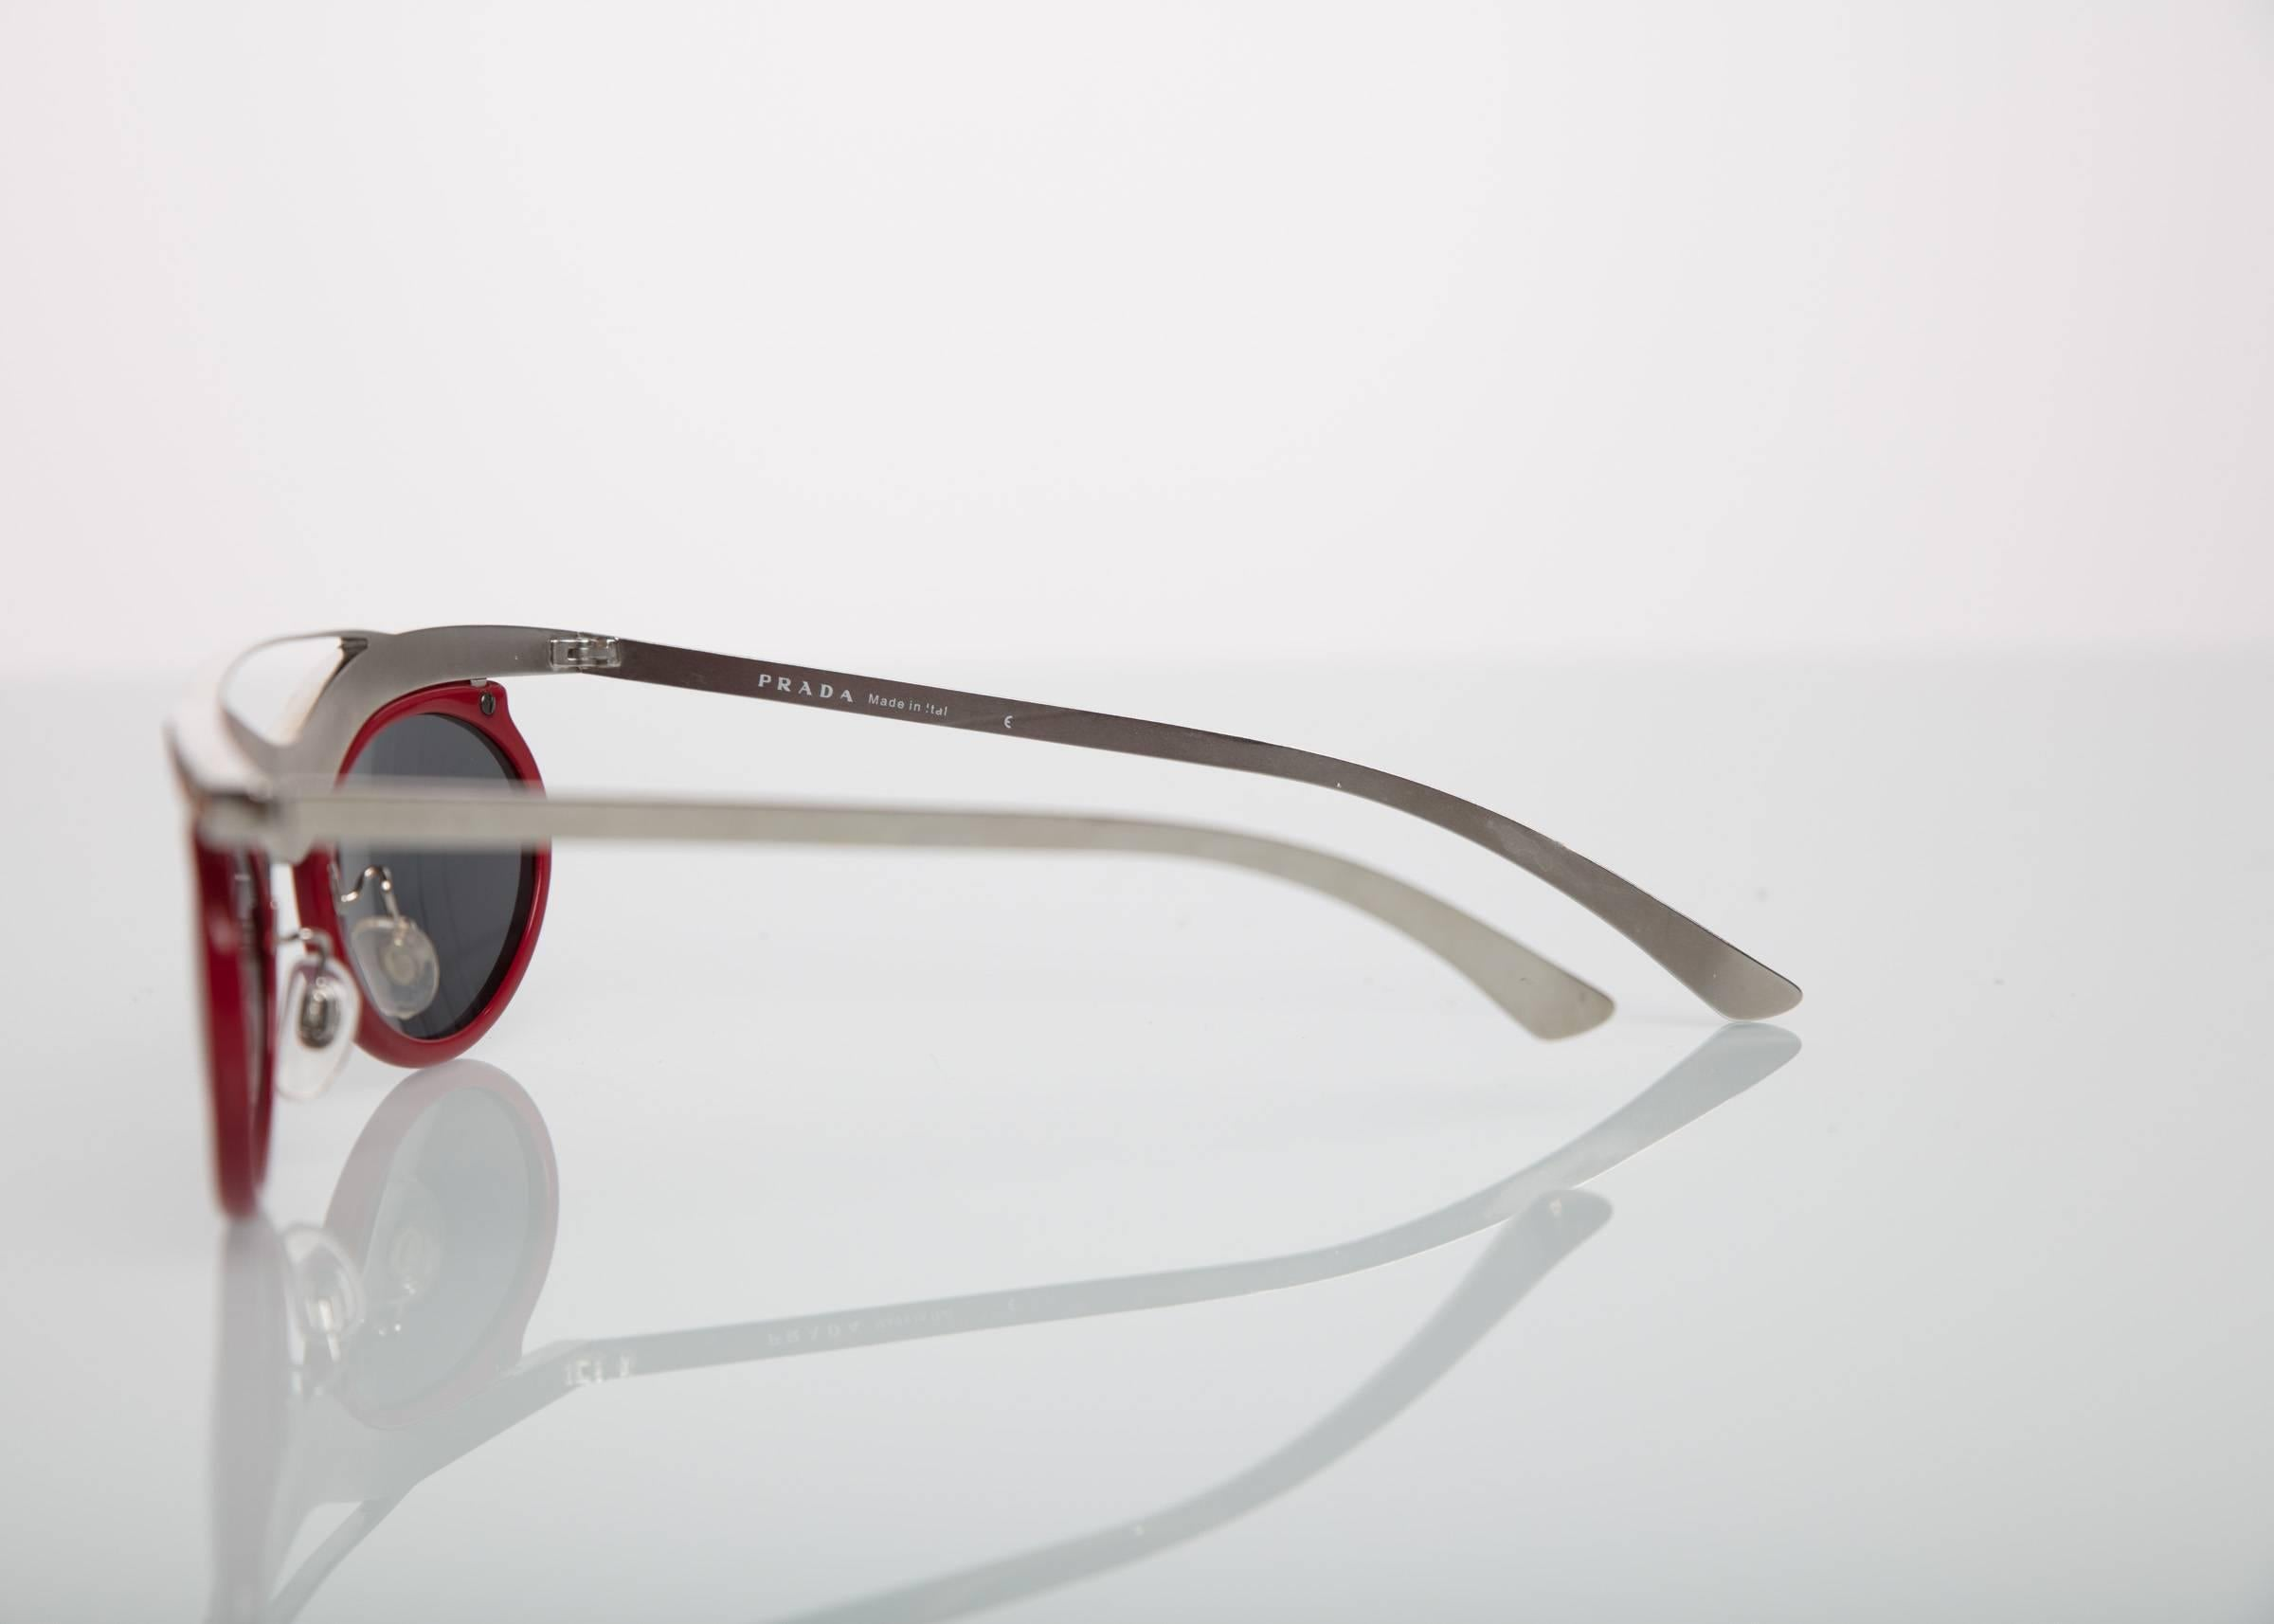 b683fed71668 where to buy 2012 prada runway red cat eye amber crystal sunglasses for  sale 2 bdb25